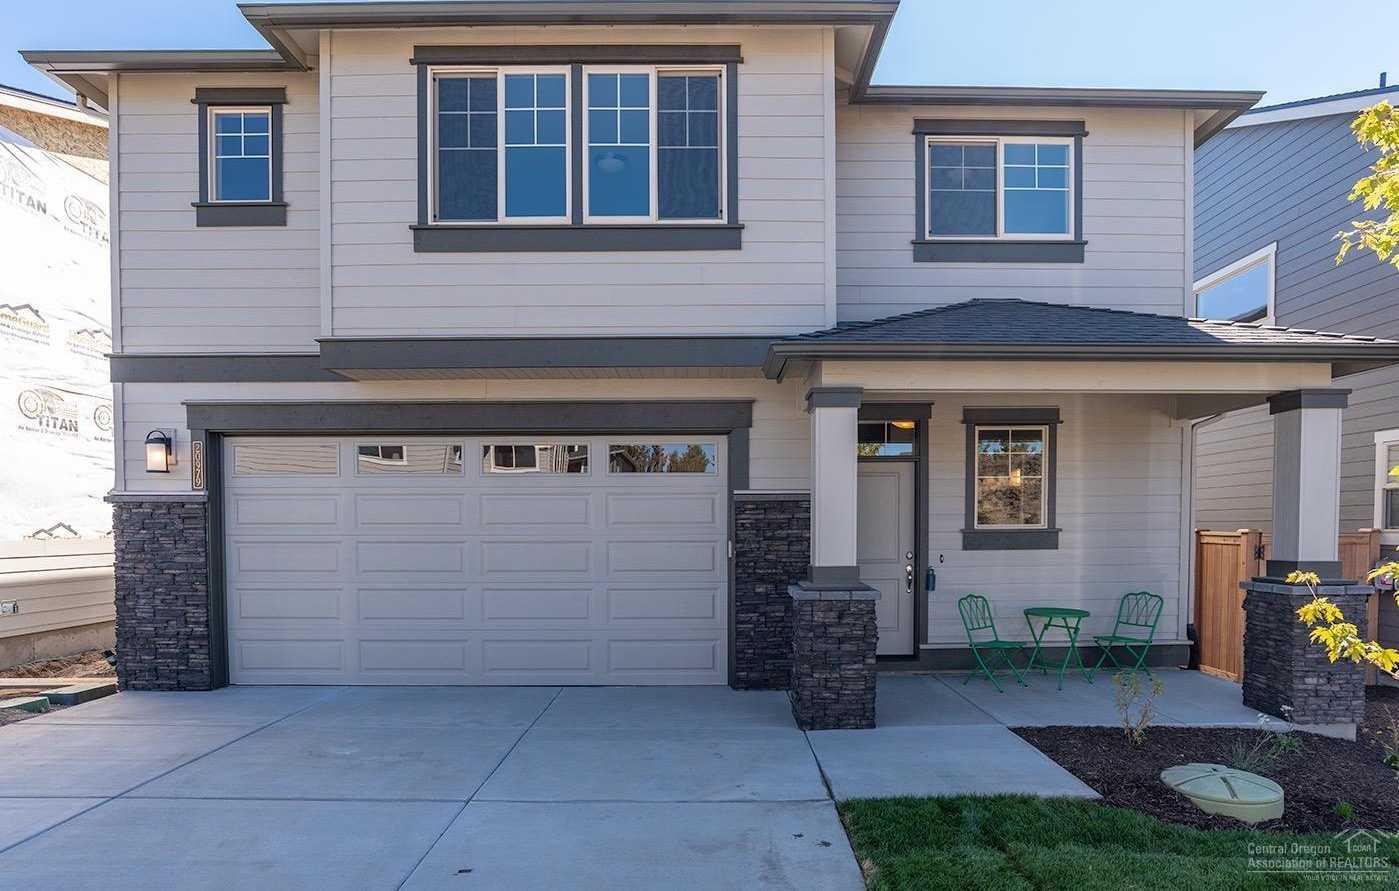 Bend Oregon Real Estate- Cate Cushman & Bre Rouse, Realtors